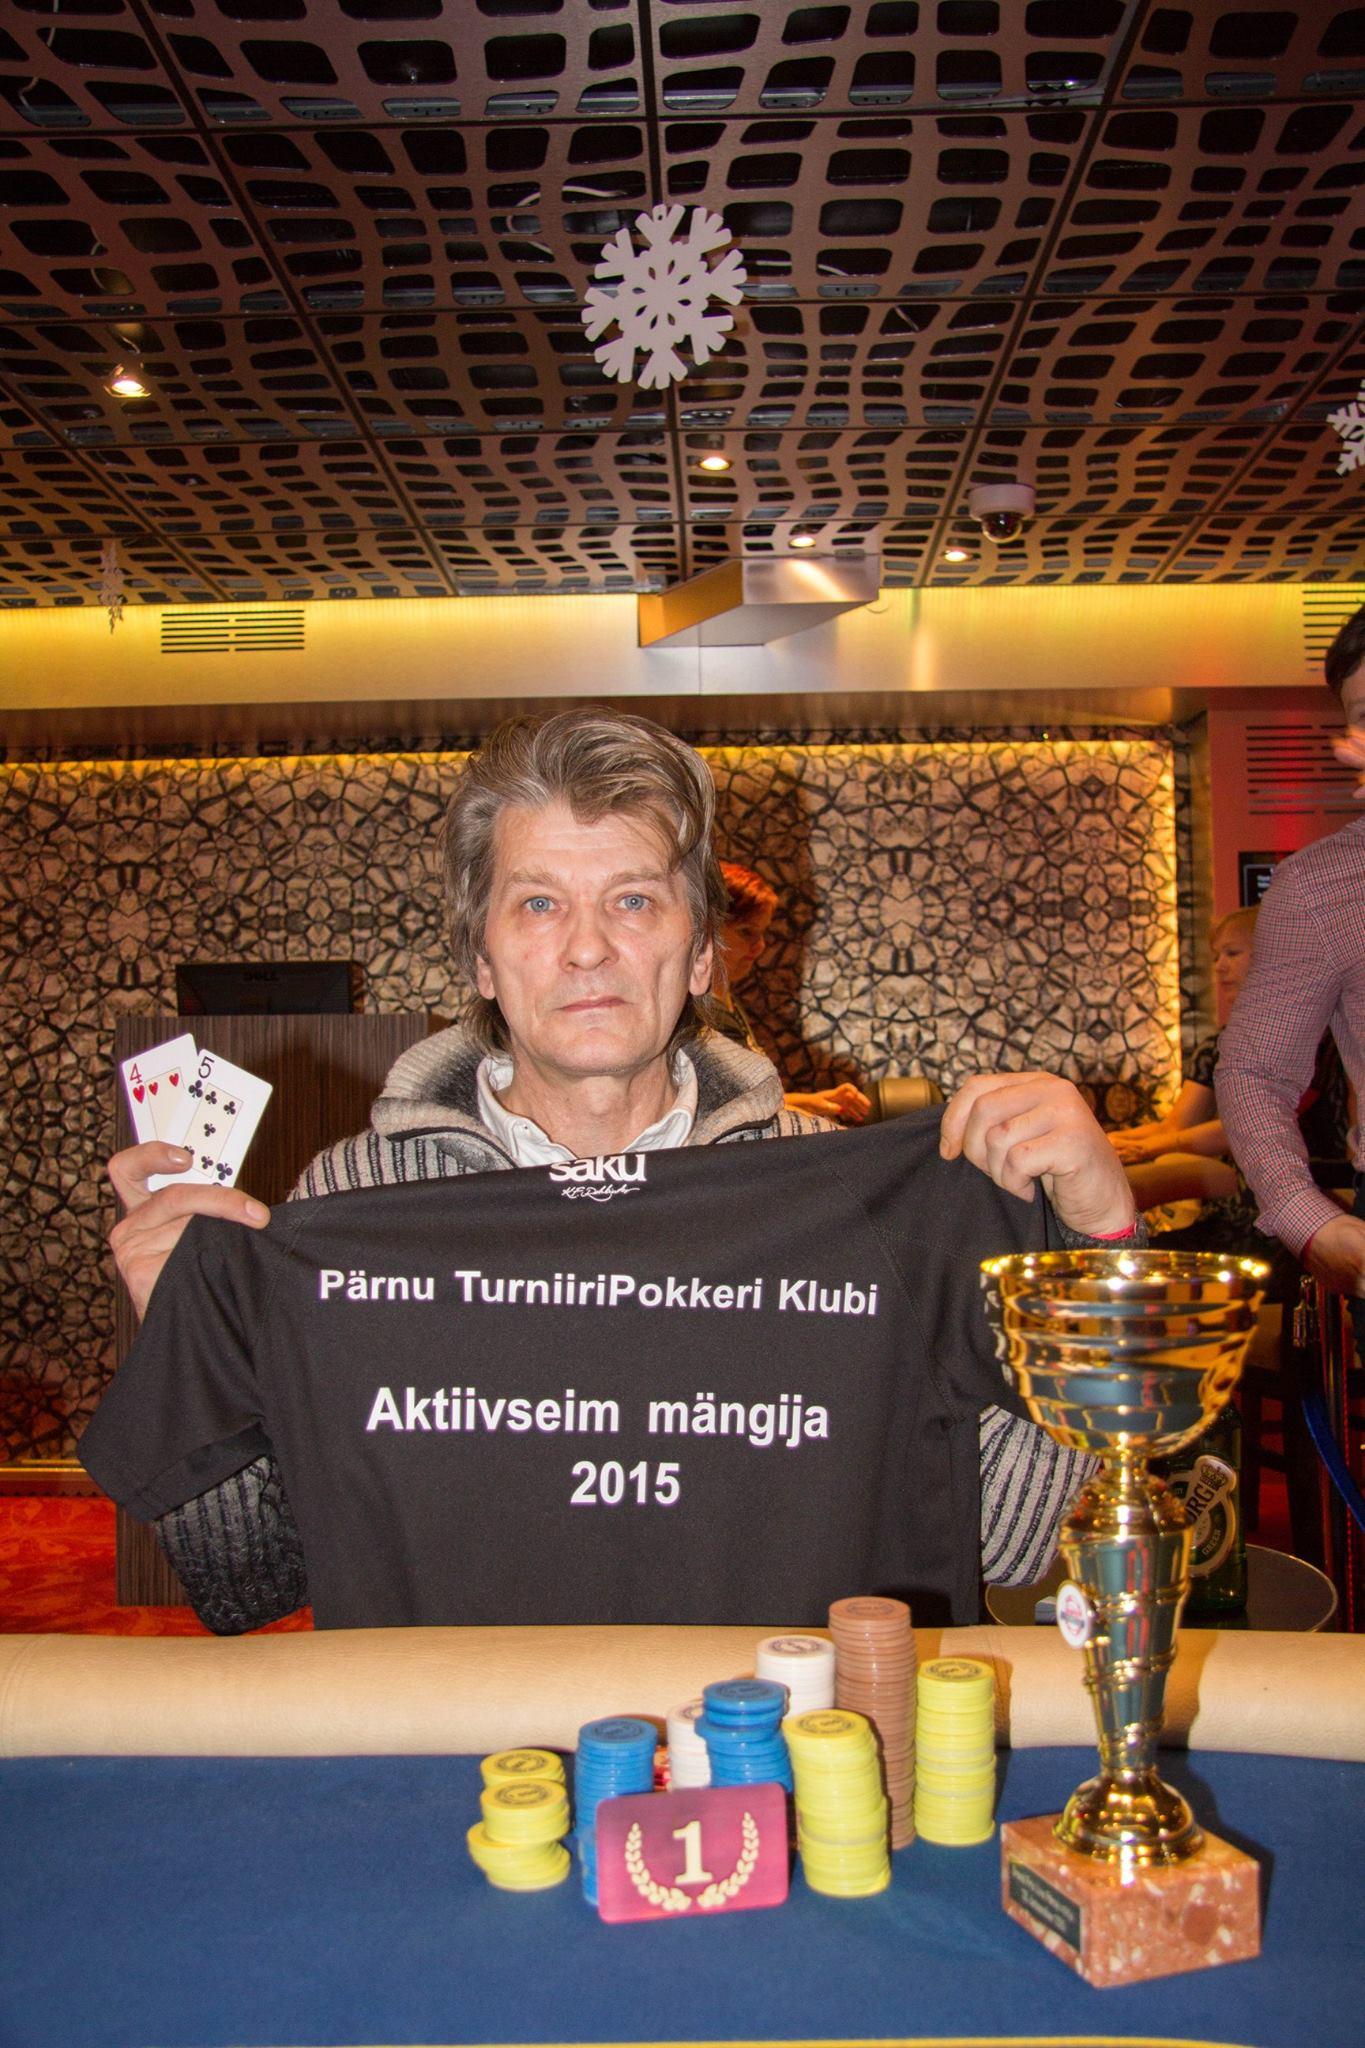 Turniiri tšempion Konstantin Marks